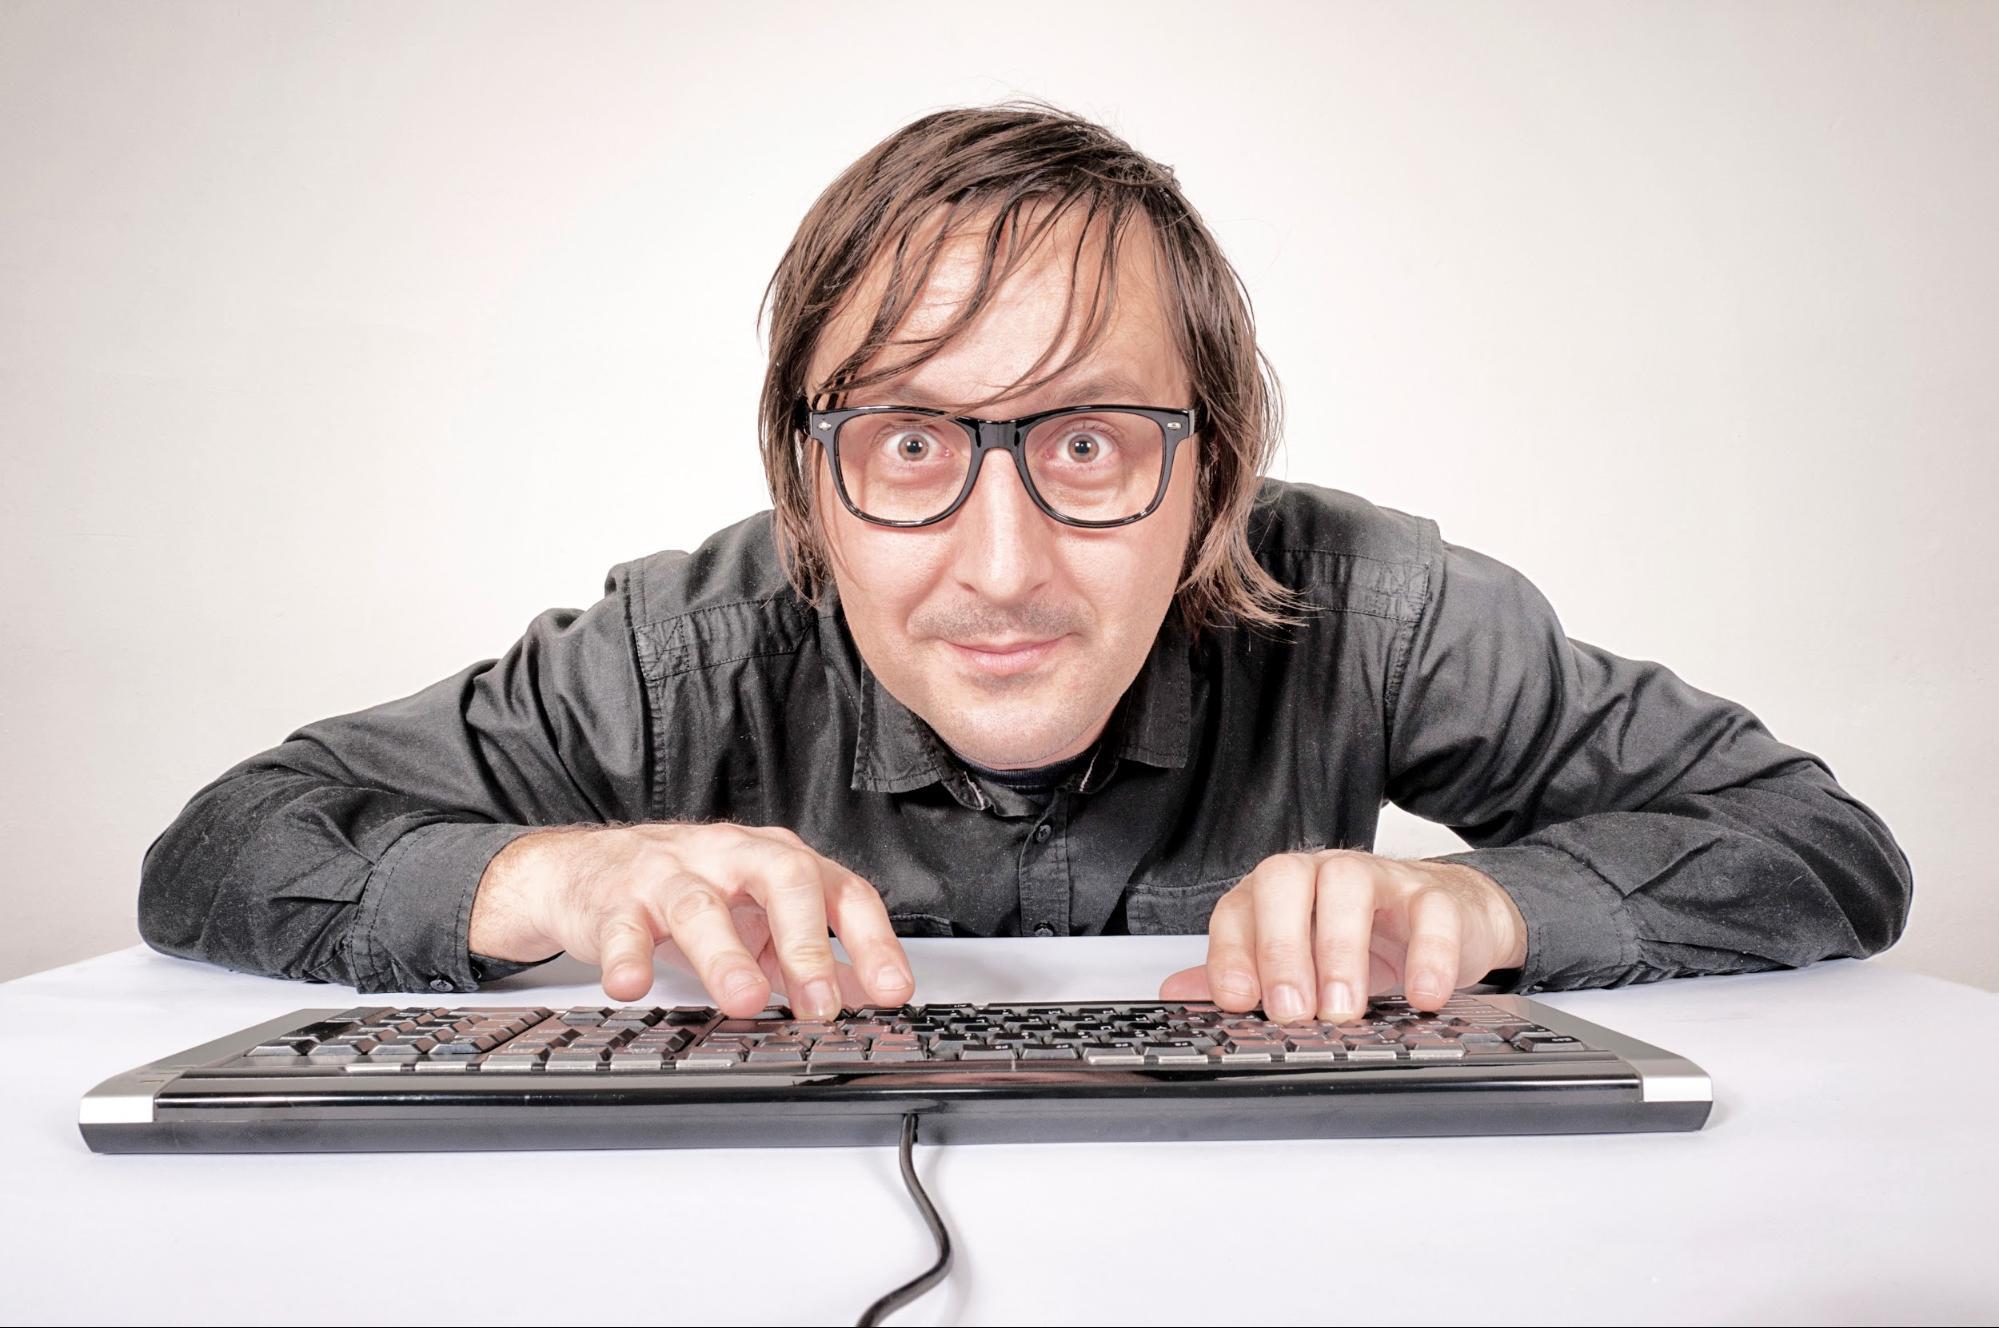 Migrar a HTTPS - Piratas informáticos